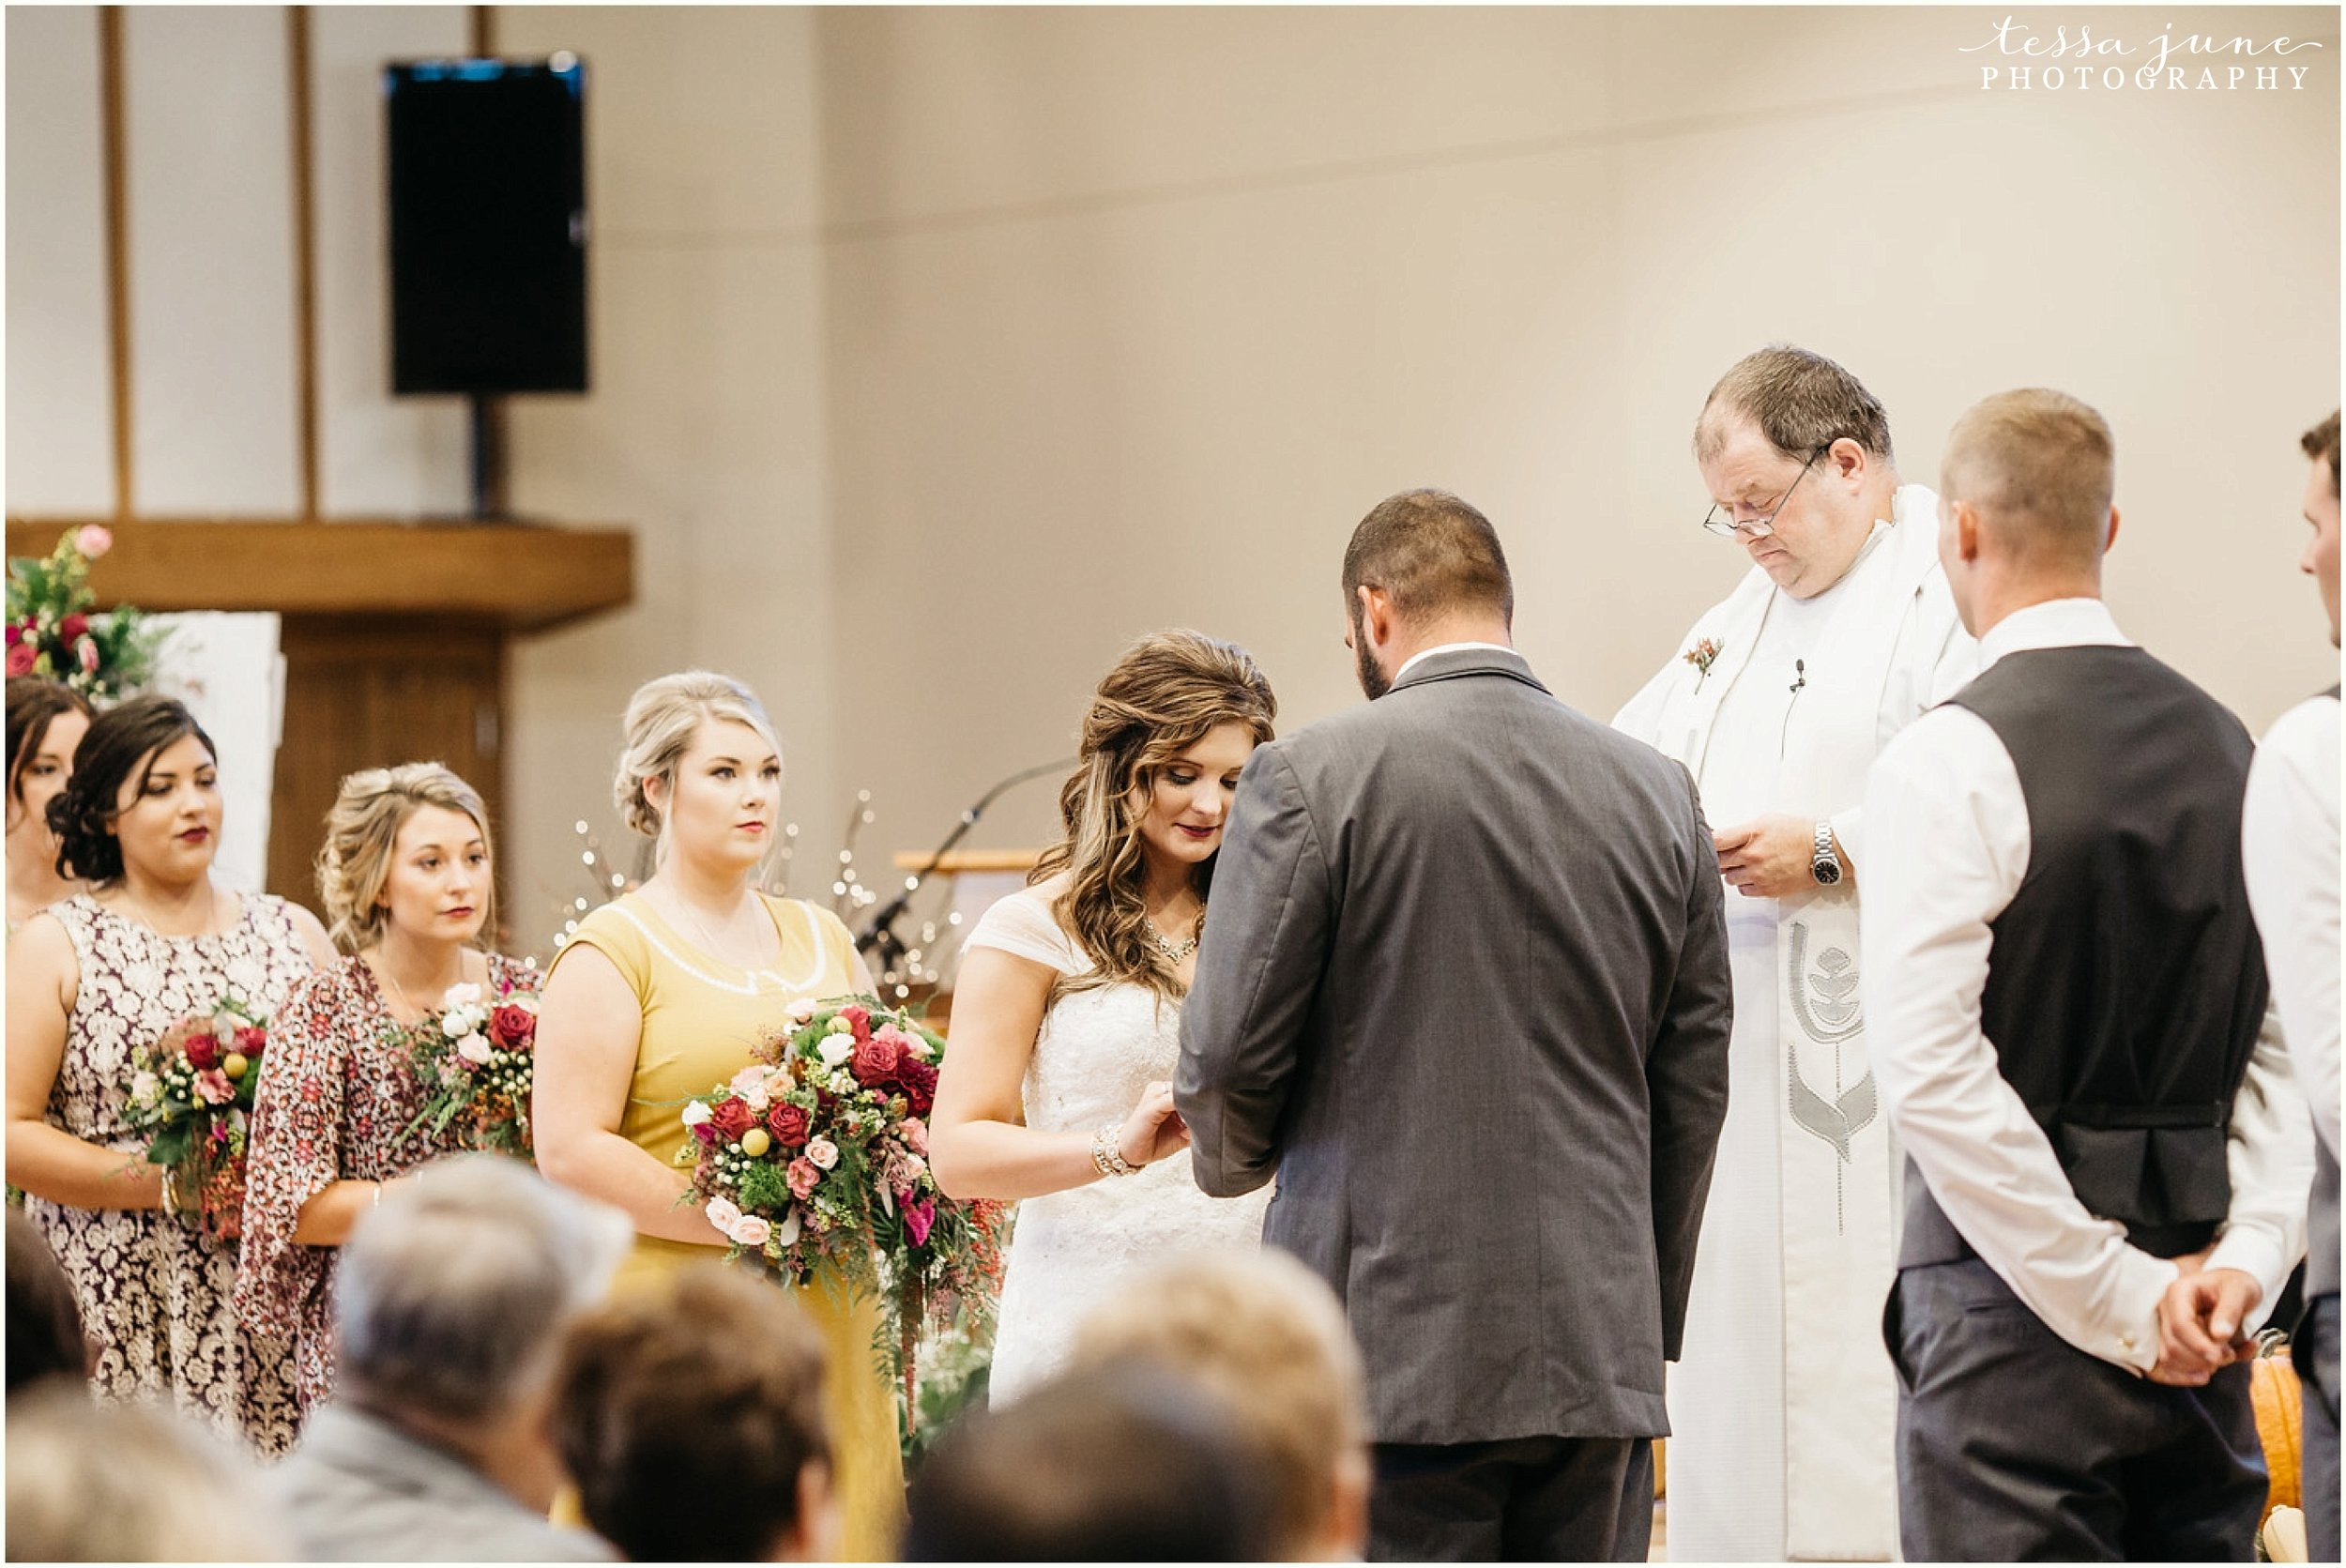 bohemian-minnesota-wedding-mismatched-bridesmaid-dresses-waterfall-st-cloud-tessa-june-photography-109.jpg